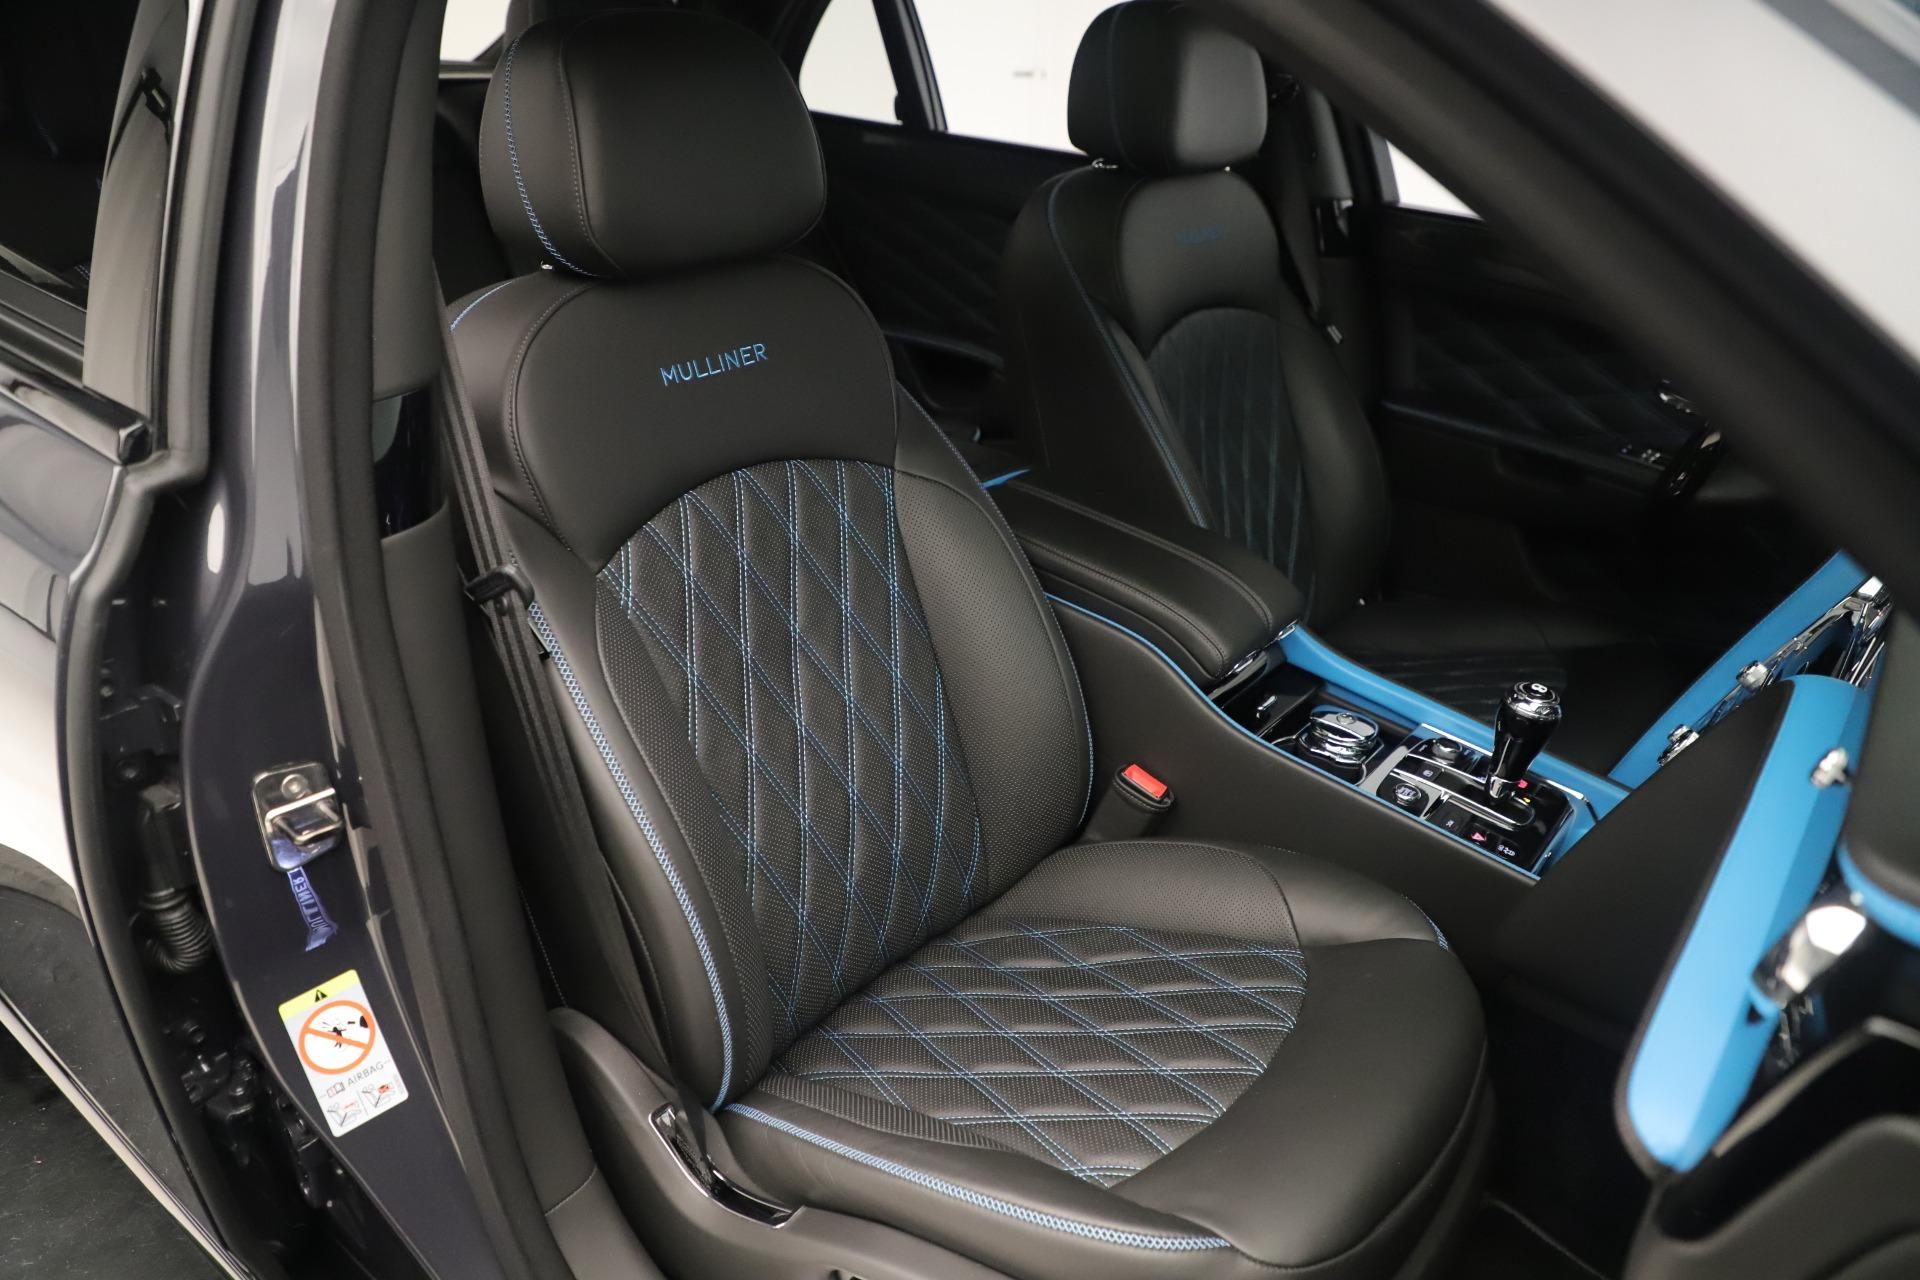 Used 2018 Bentley Mulsanne Speed Design Series For Sale In Westport, CT 3405_p32